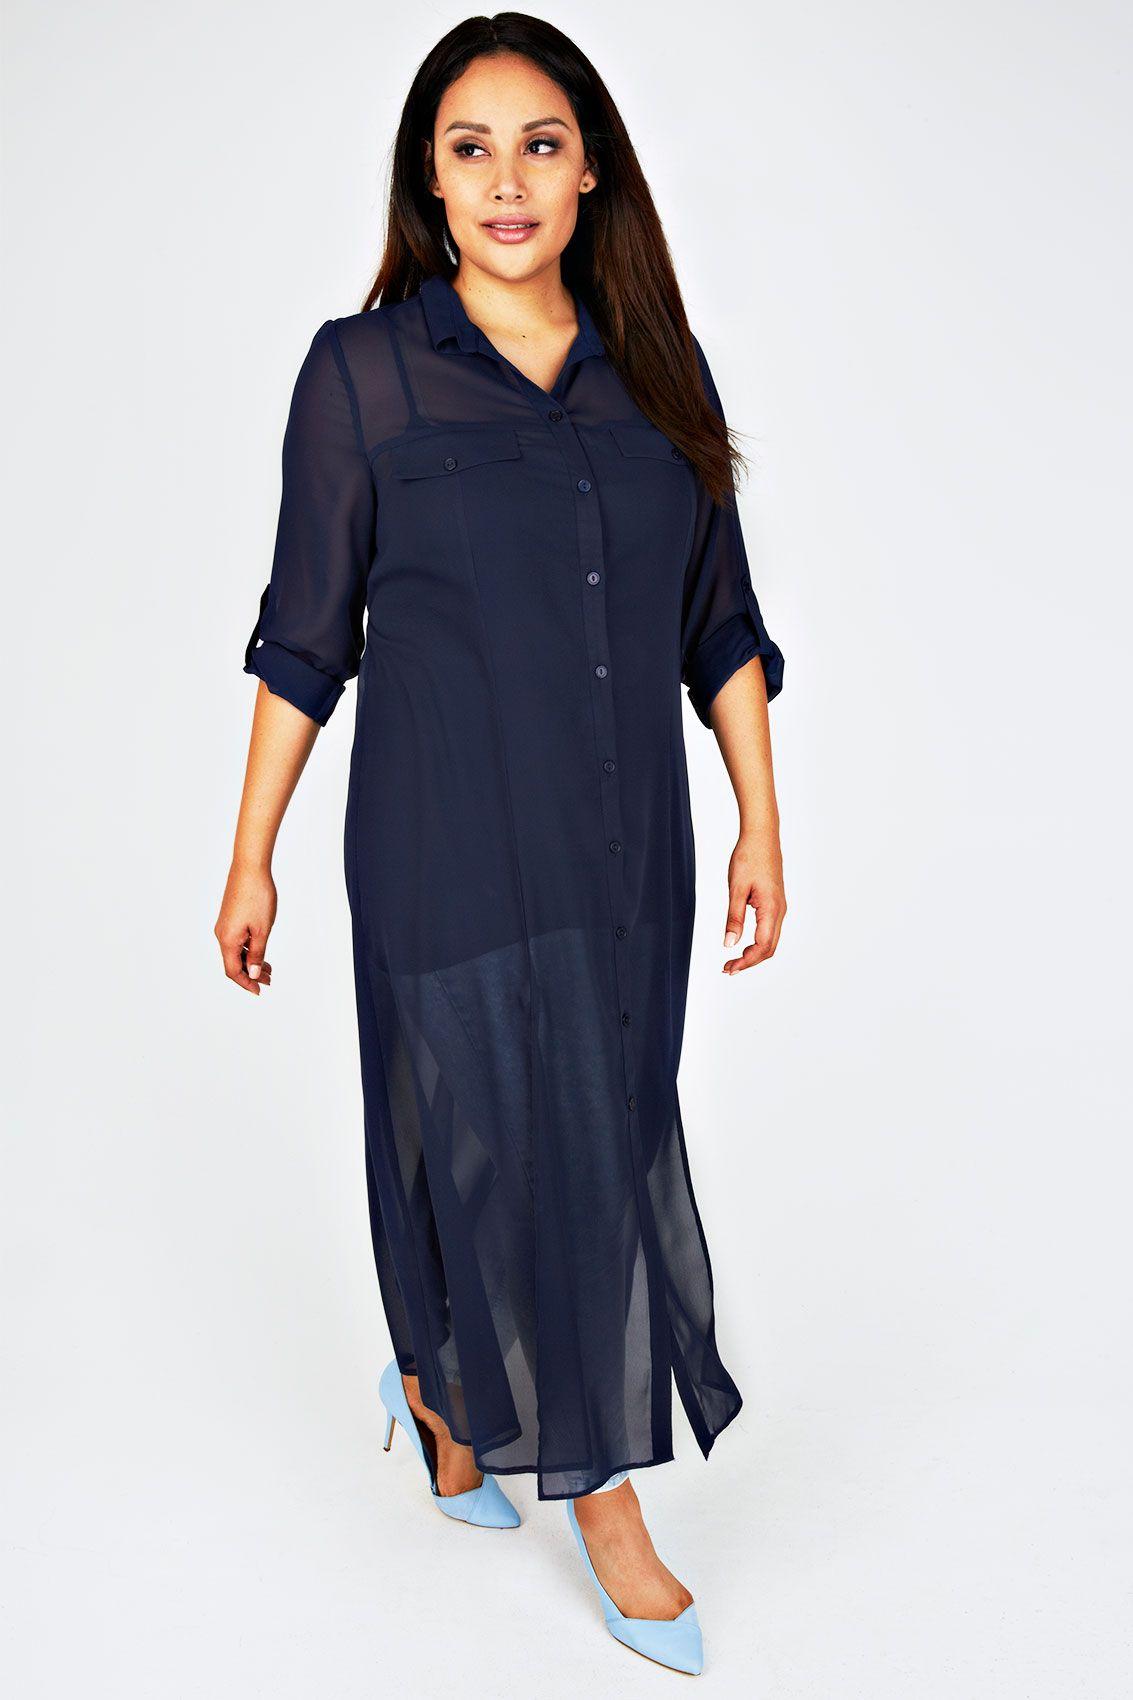 SCARLETT & JO Navy Sheer Maxi Shirt Dress With Front Splits ...